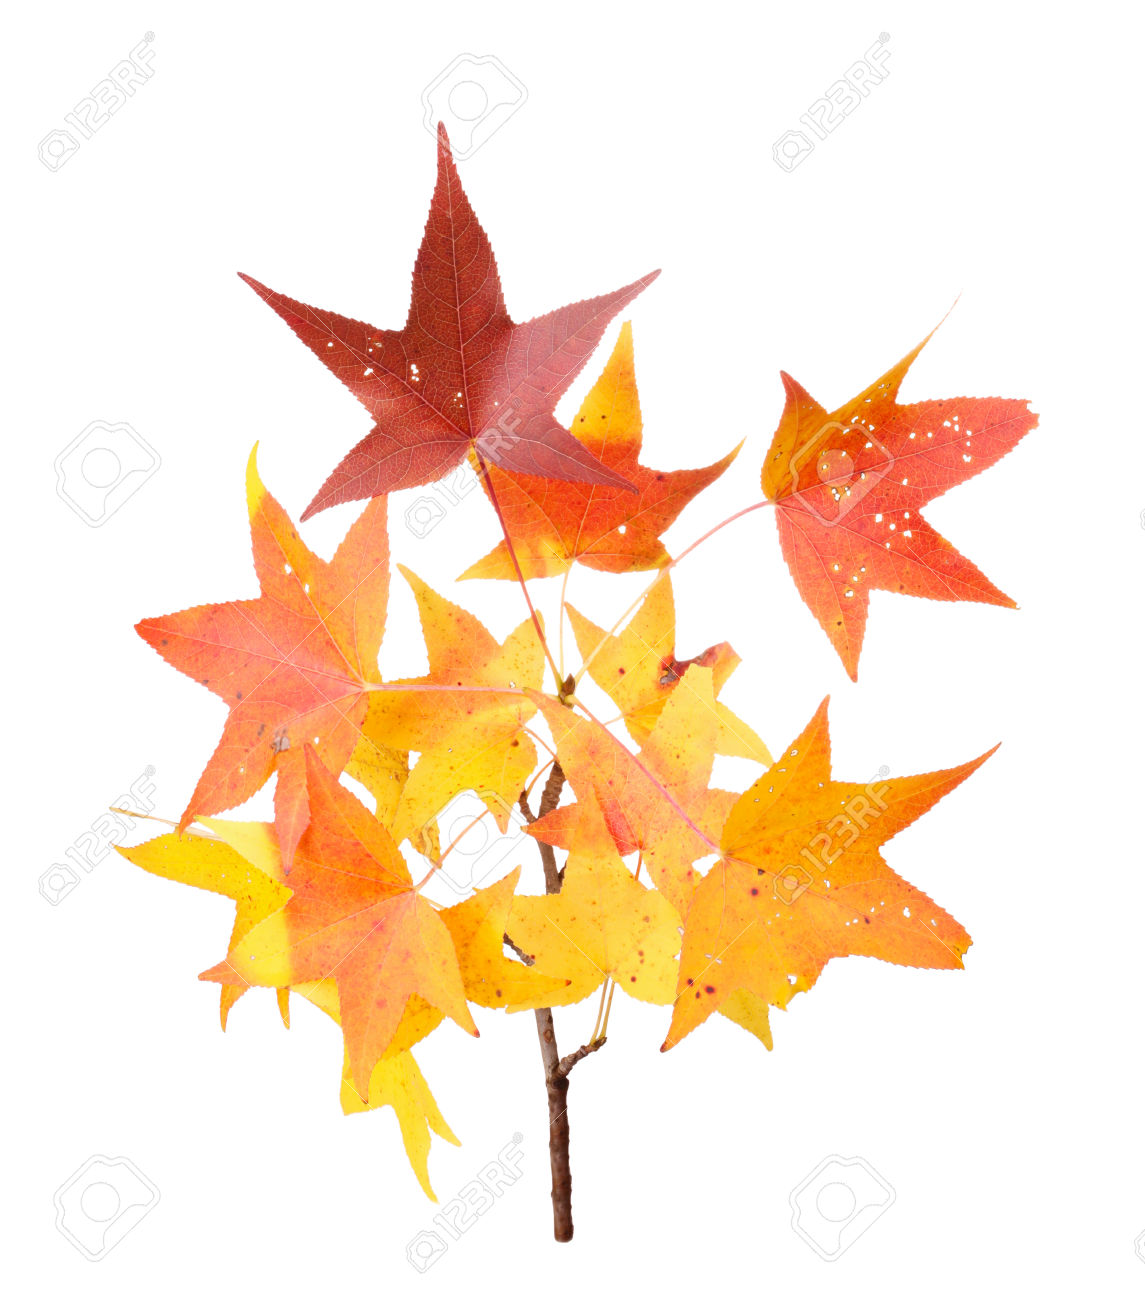 Red, Yellow And Orange Fall Leaves Of Sweet Gum Liquidambar.